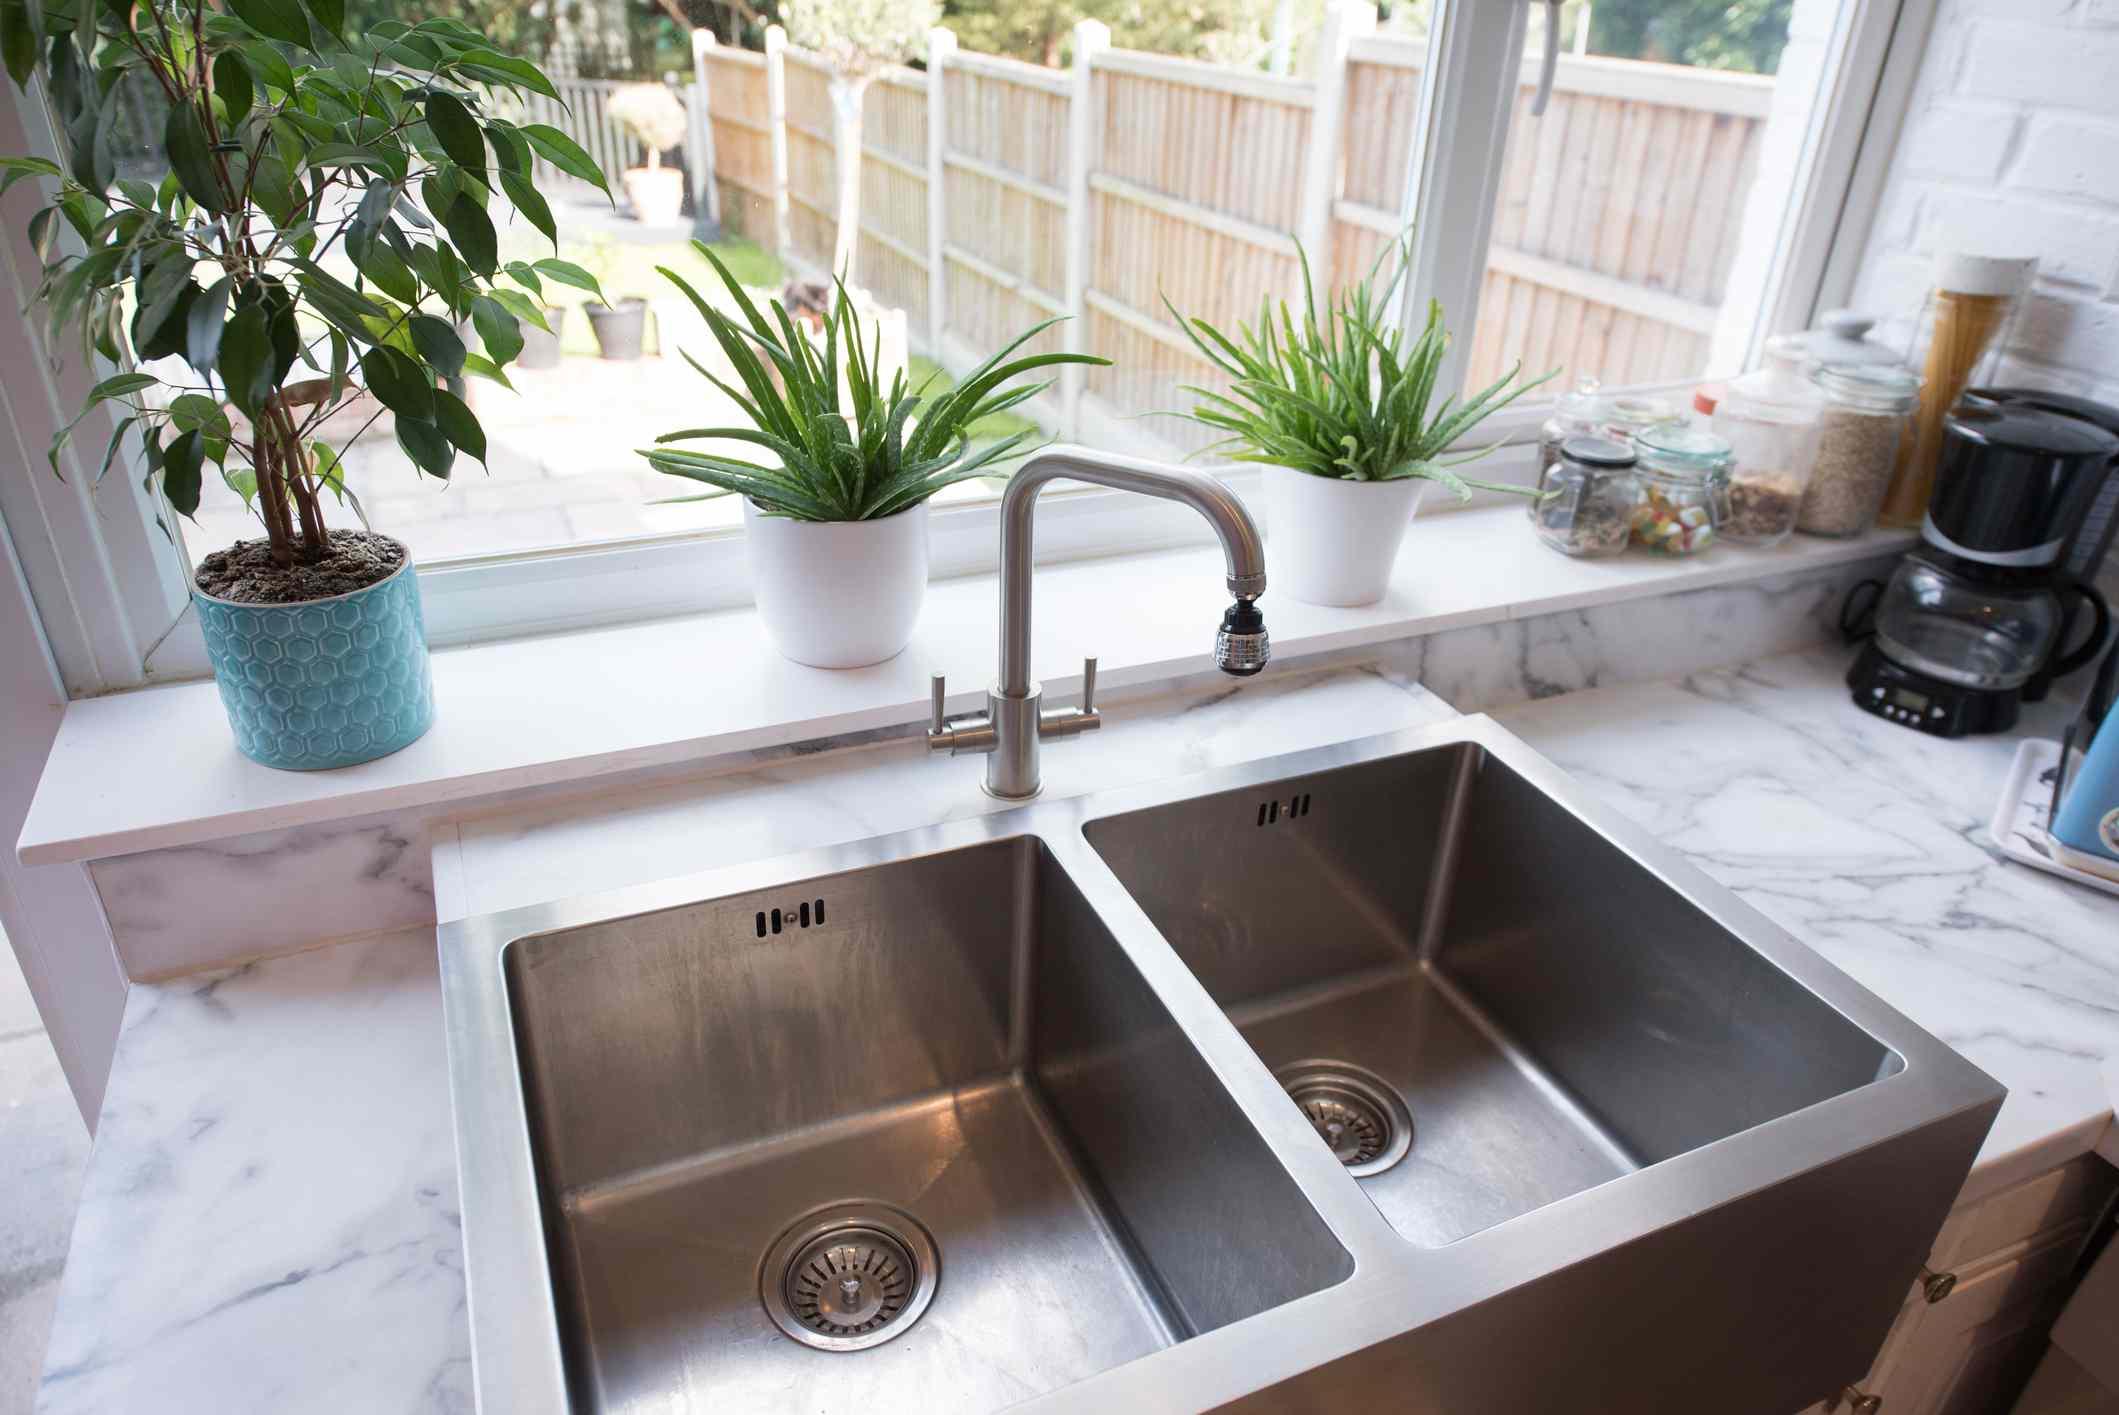 Kitchen double basin sink